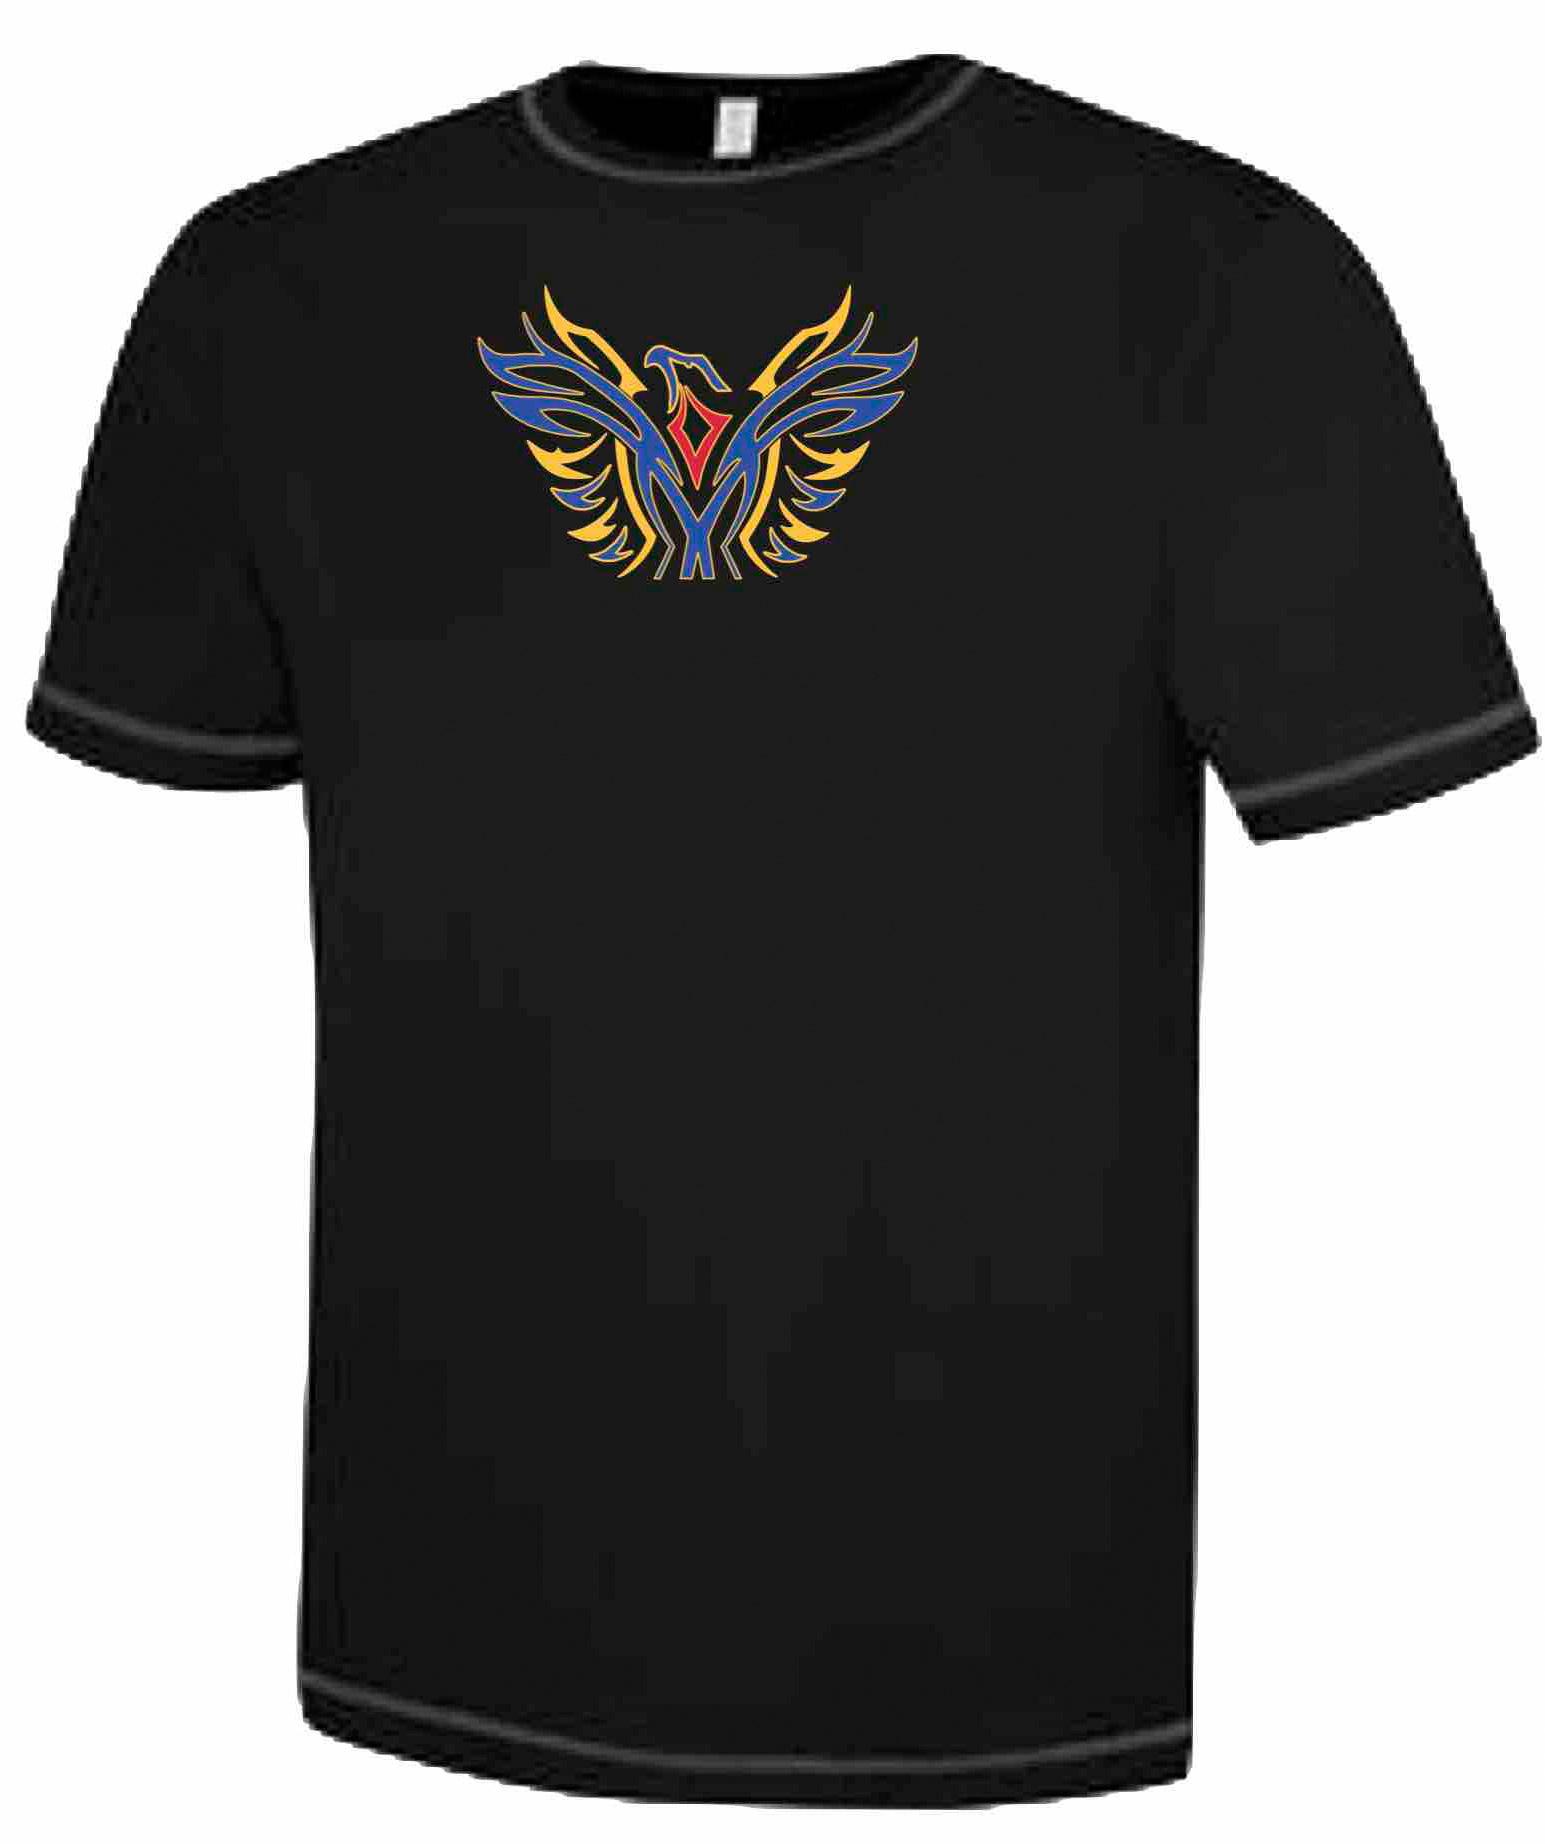 BLACK - Ultra Soft Short Sleeve Technical Shirt